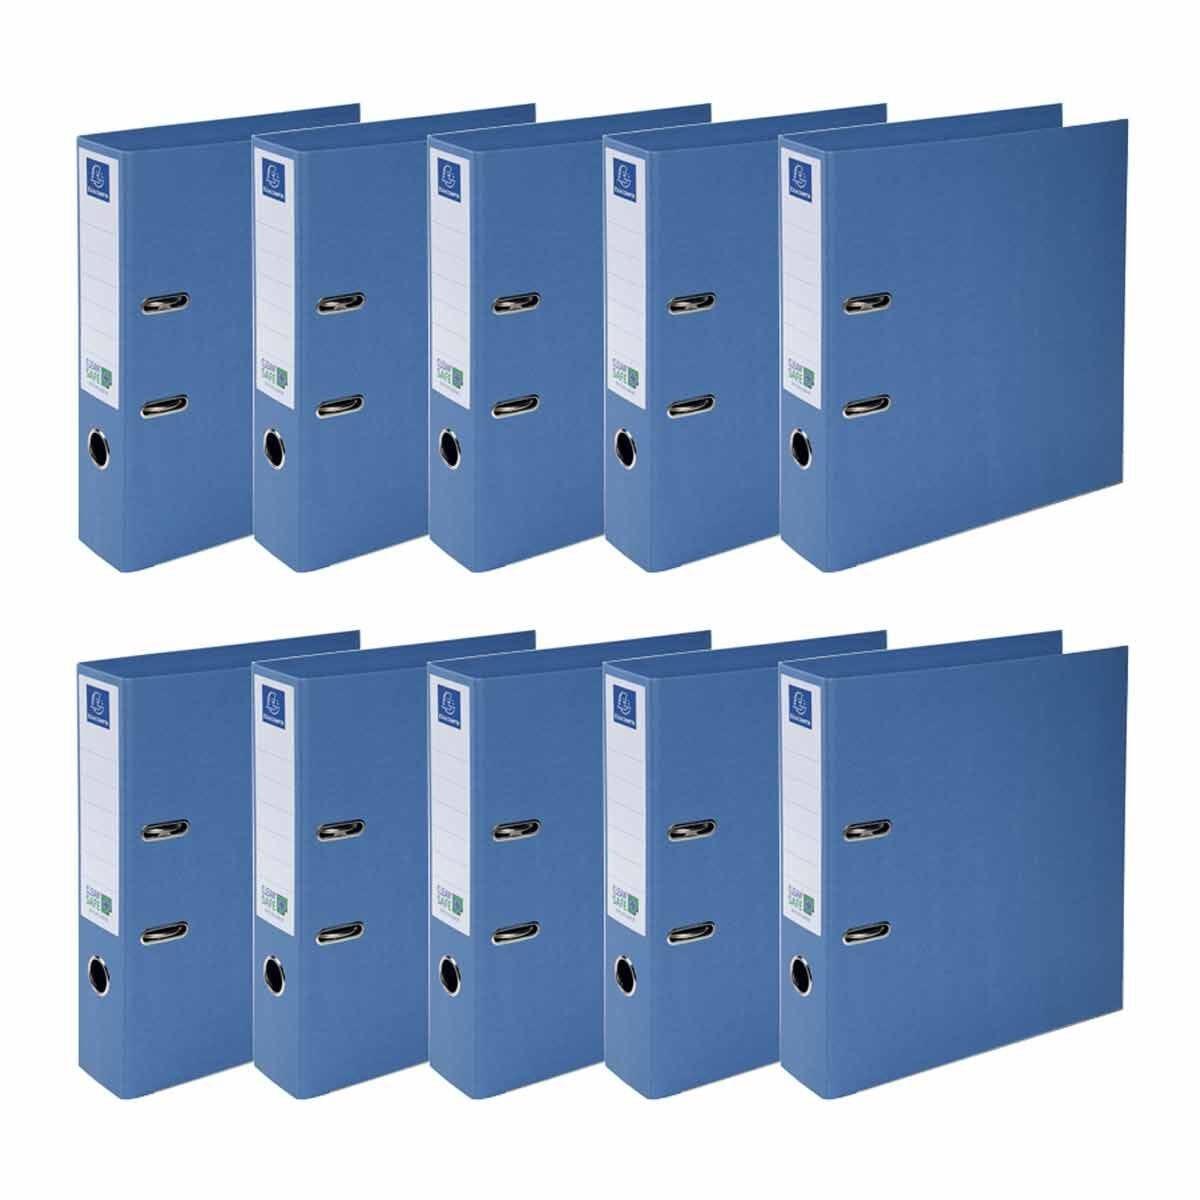 Exacompta Clean Safe Lever Arch File 70mm Spine Pack of 10